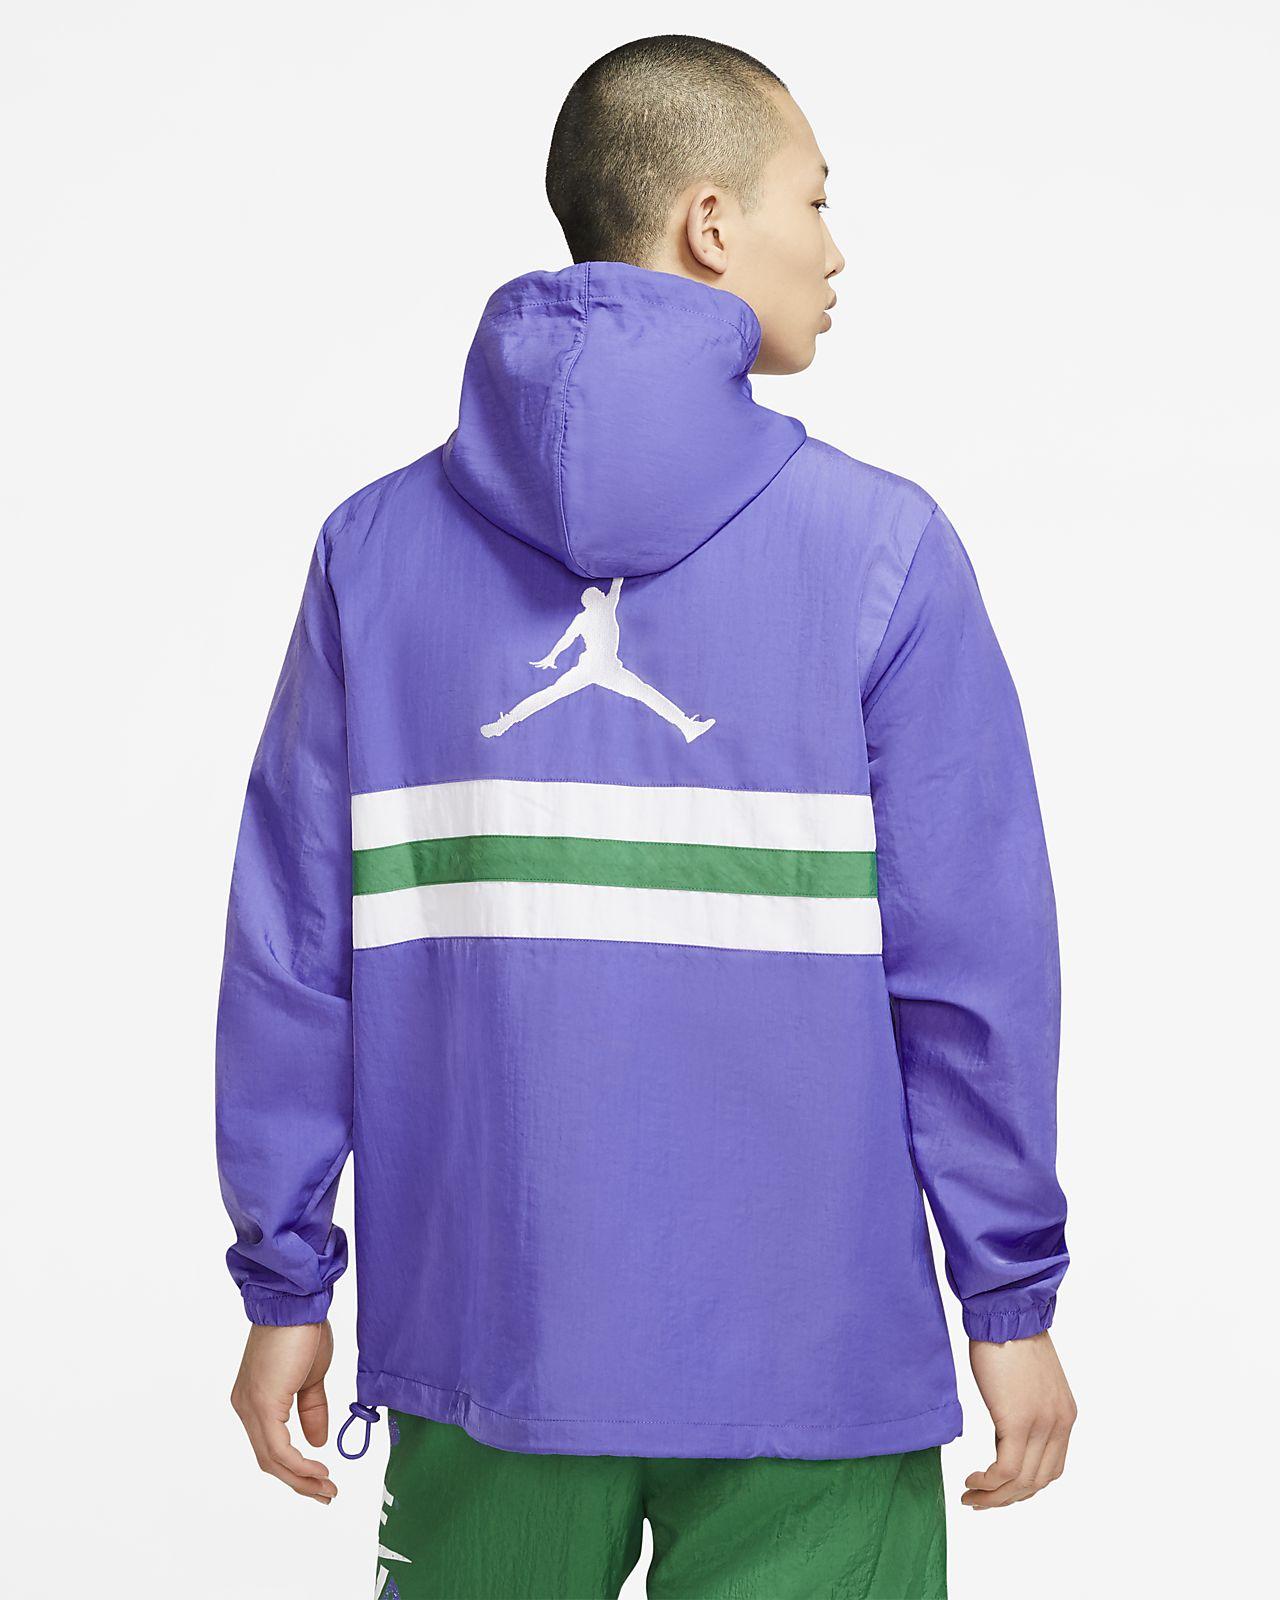 Vintage Nike Embroidered Logo Spray Jacket LXL